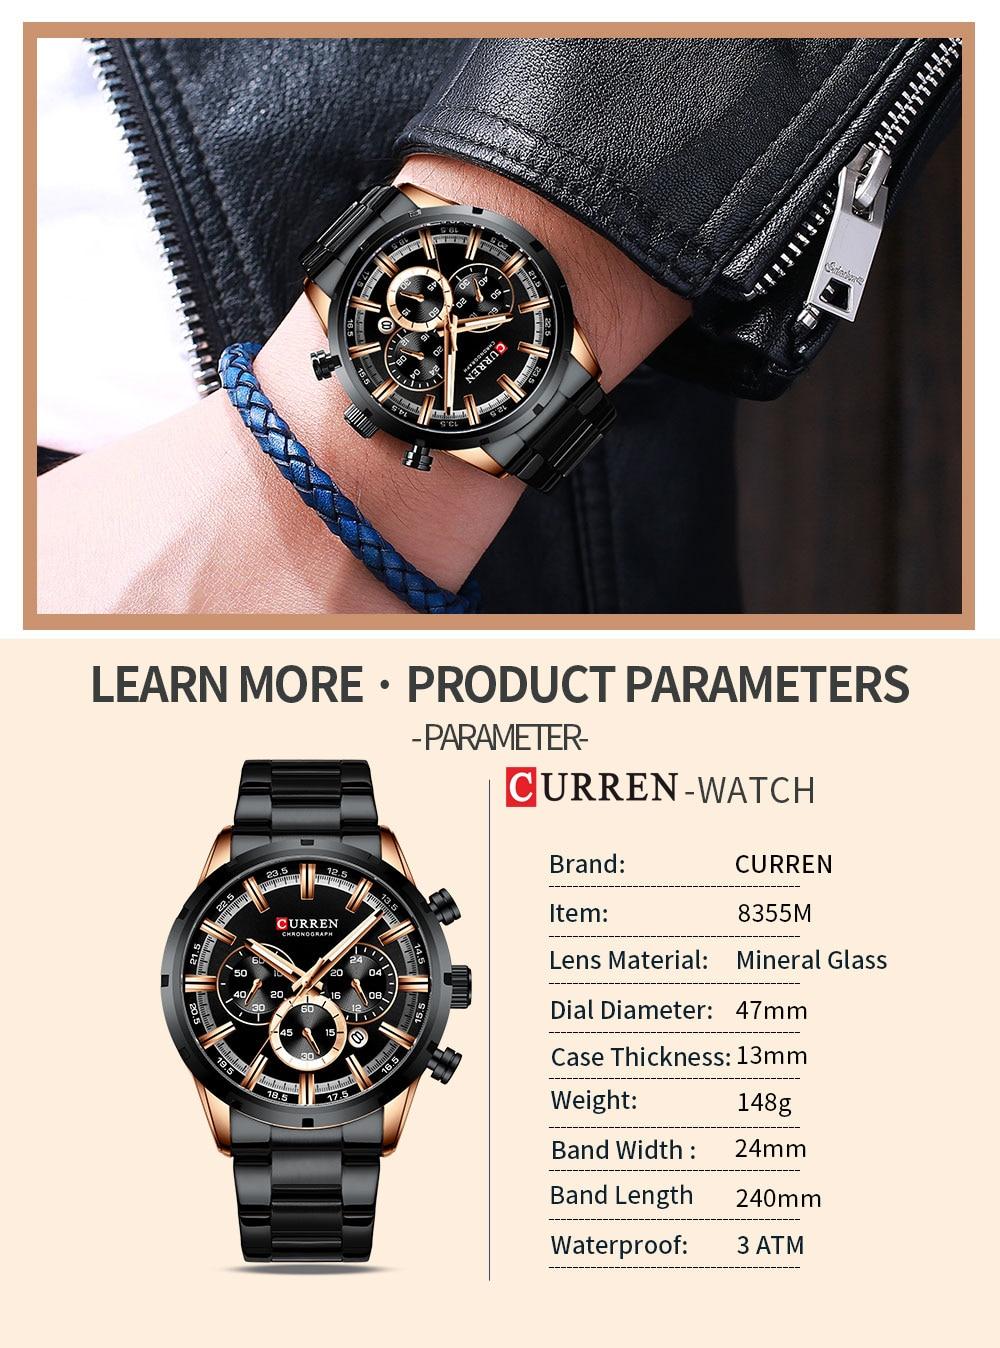 curren 8355